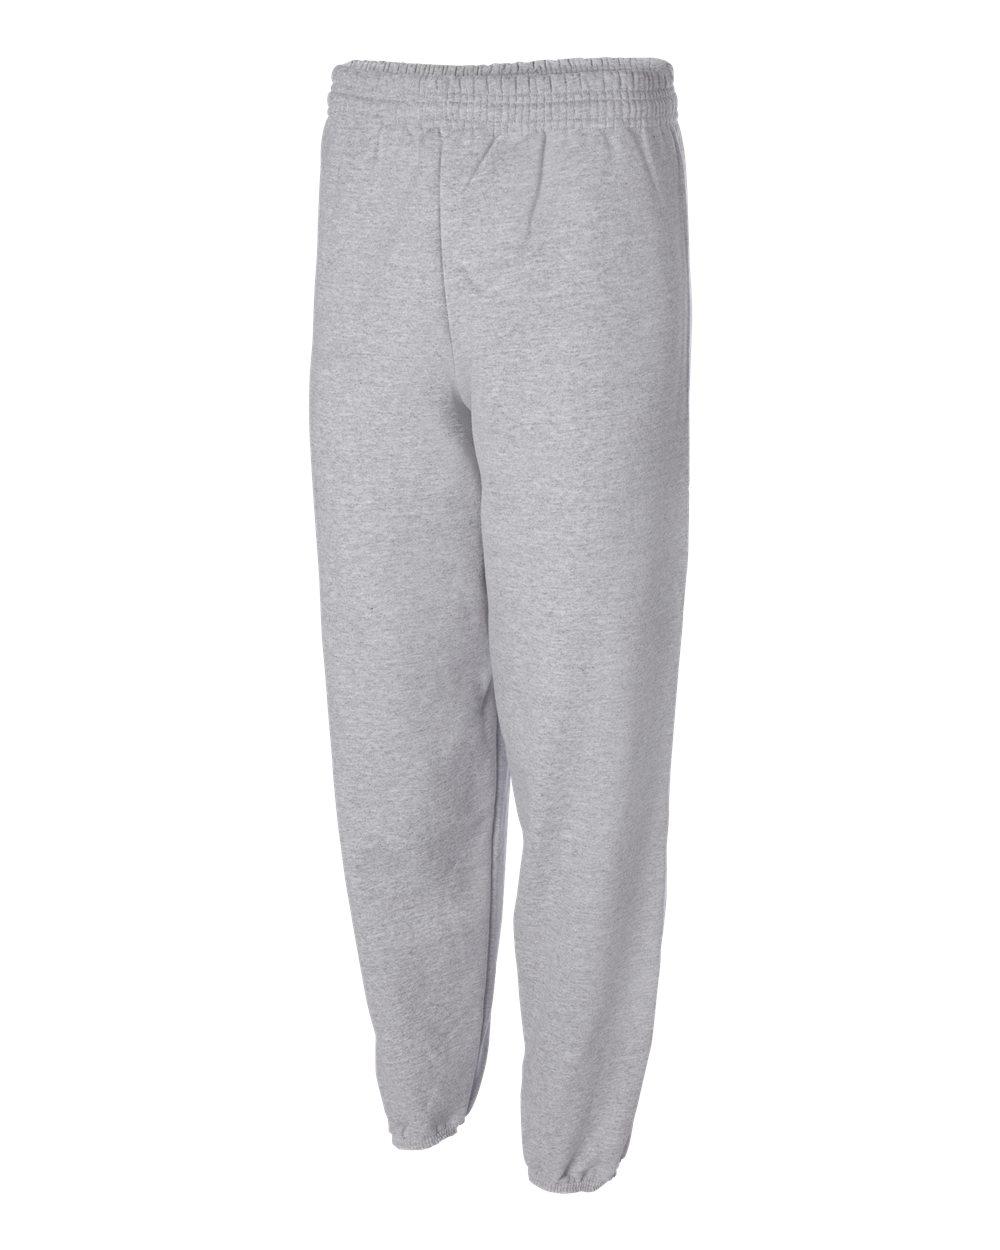 Hanes - ComfortBlend EcoSmart Sweatpants